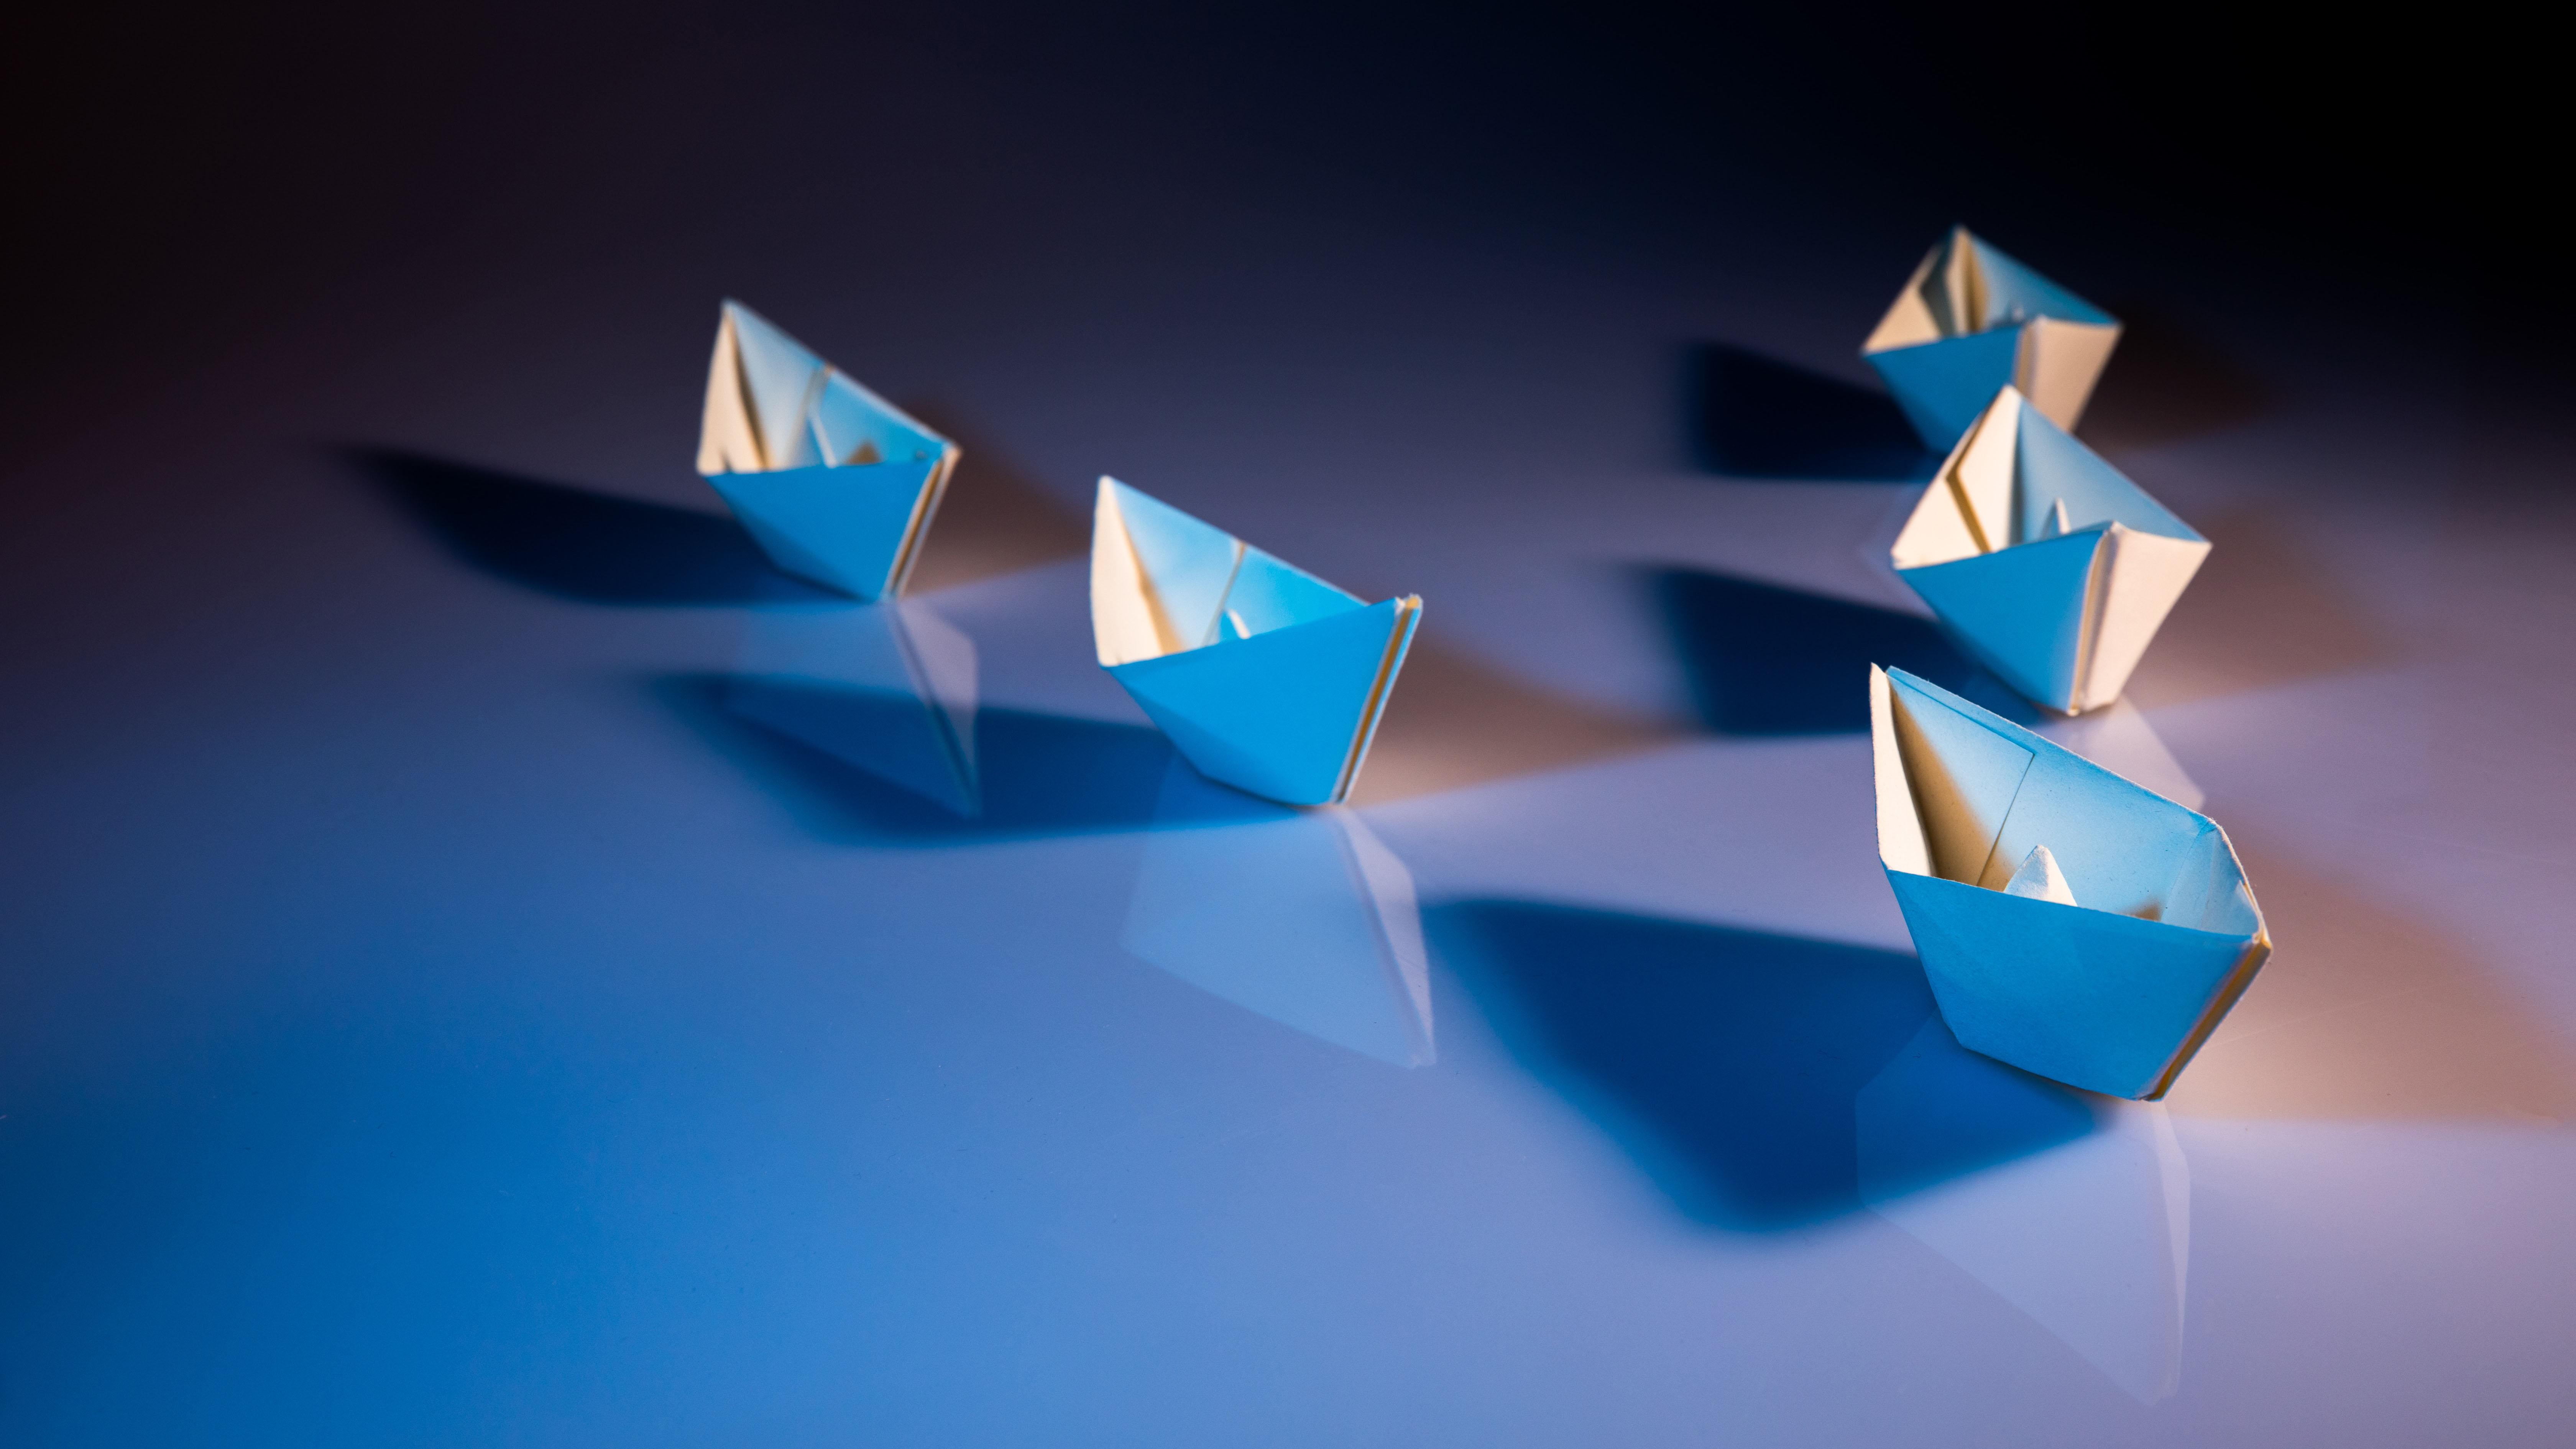 participatory leadership